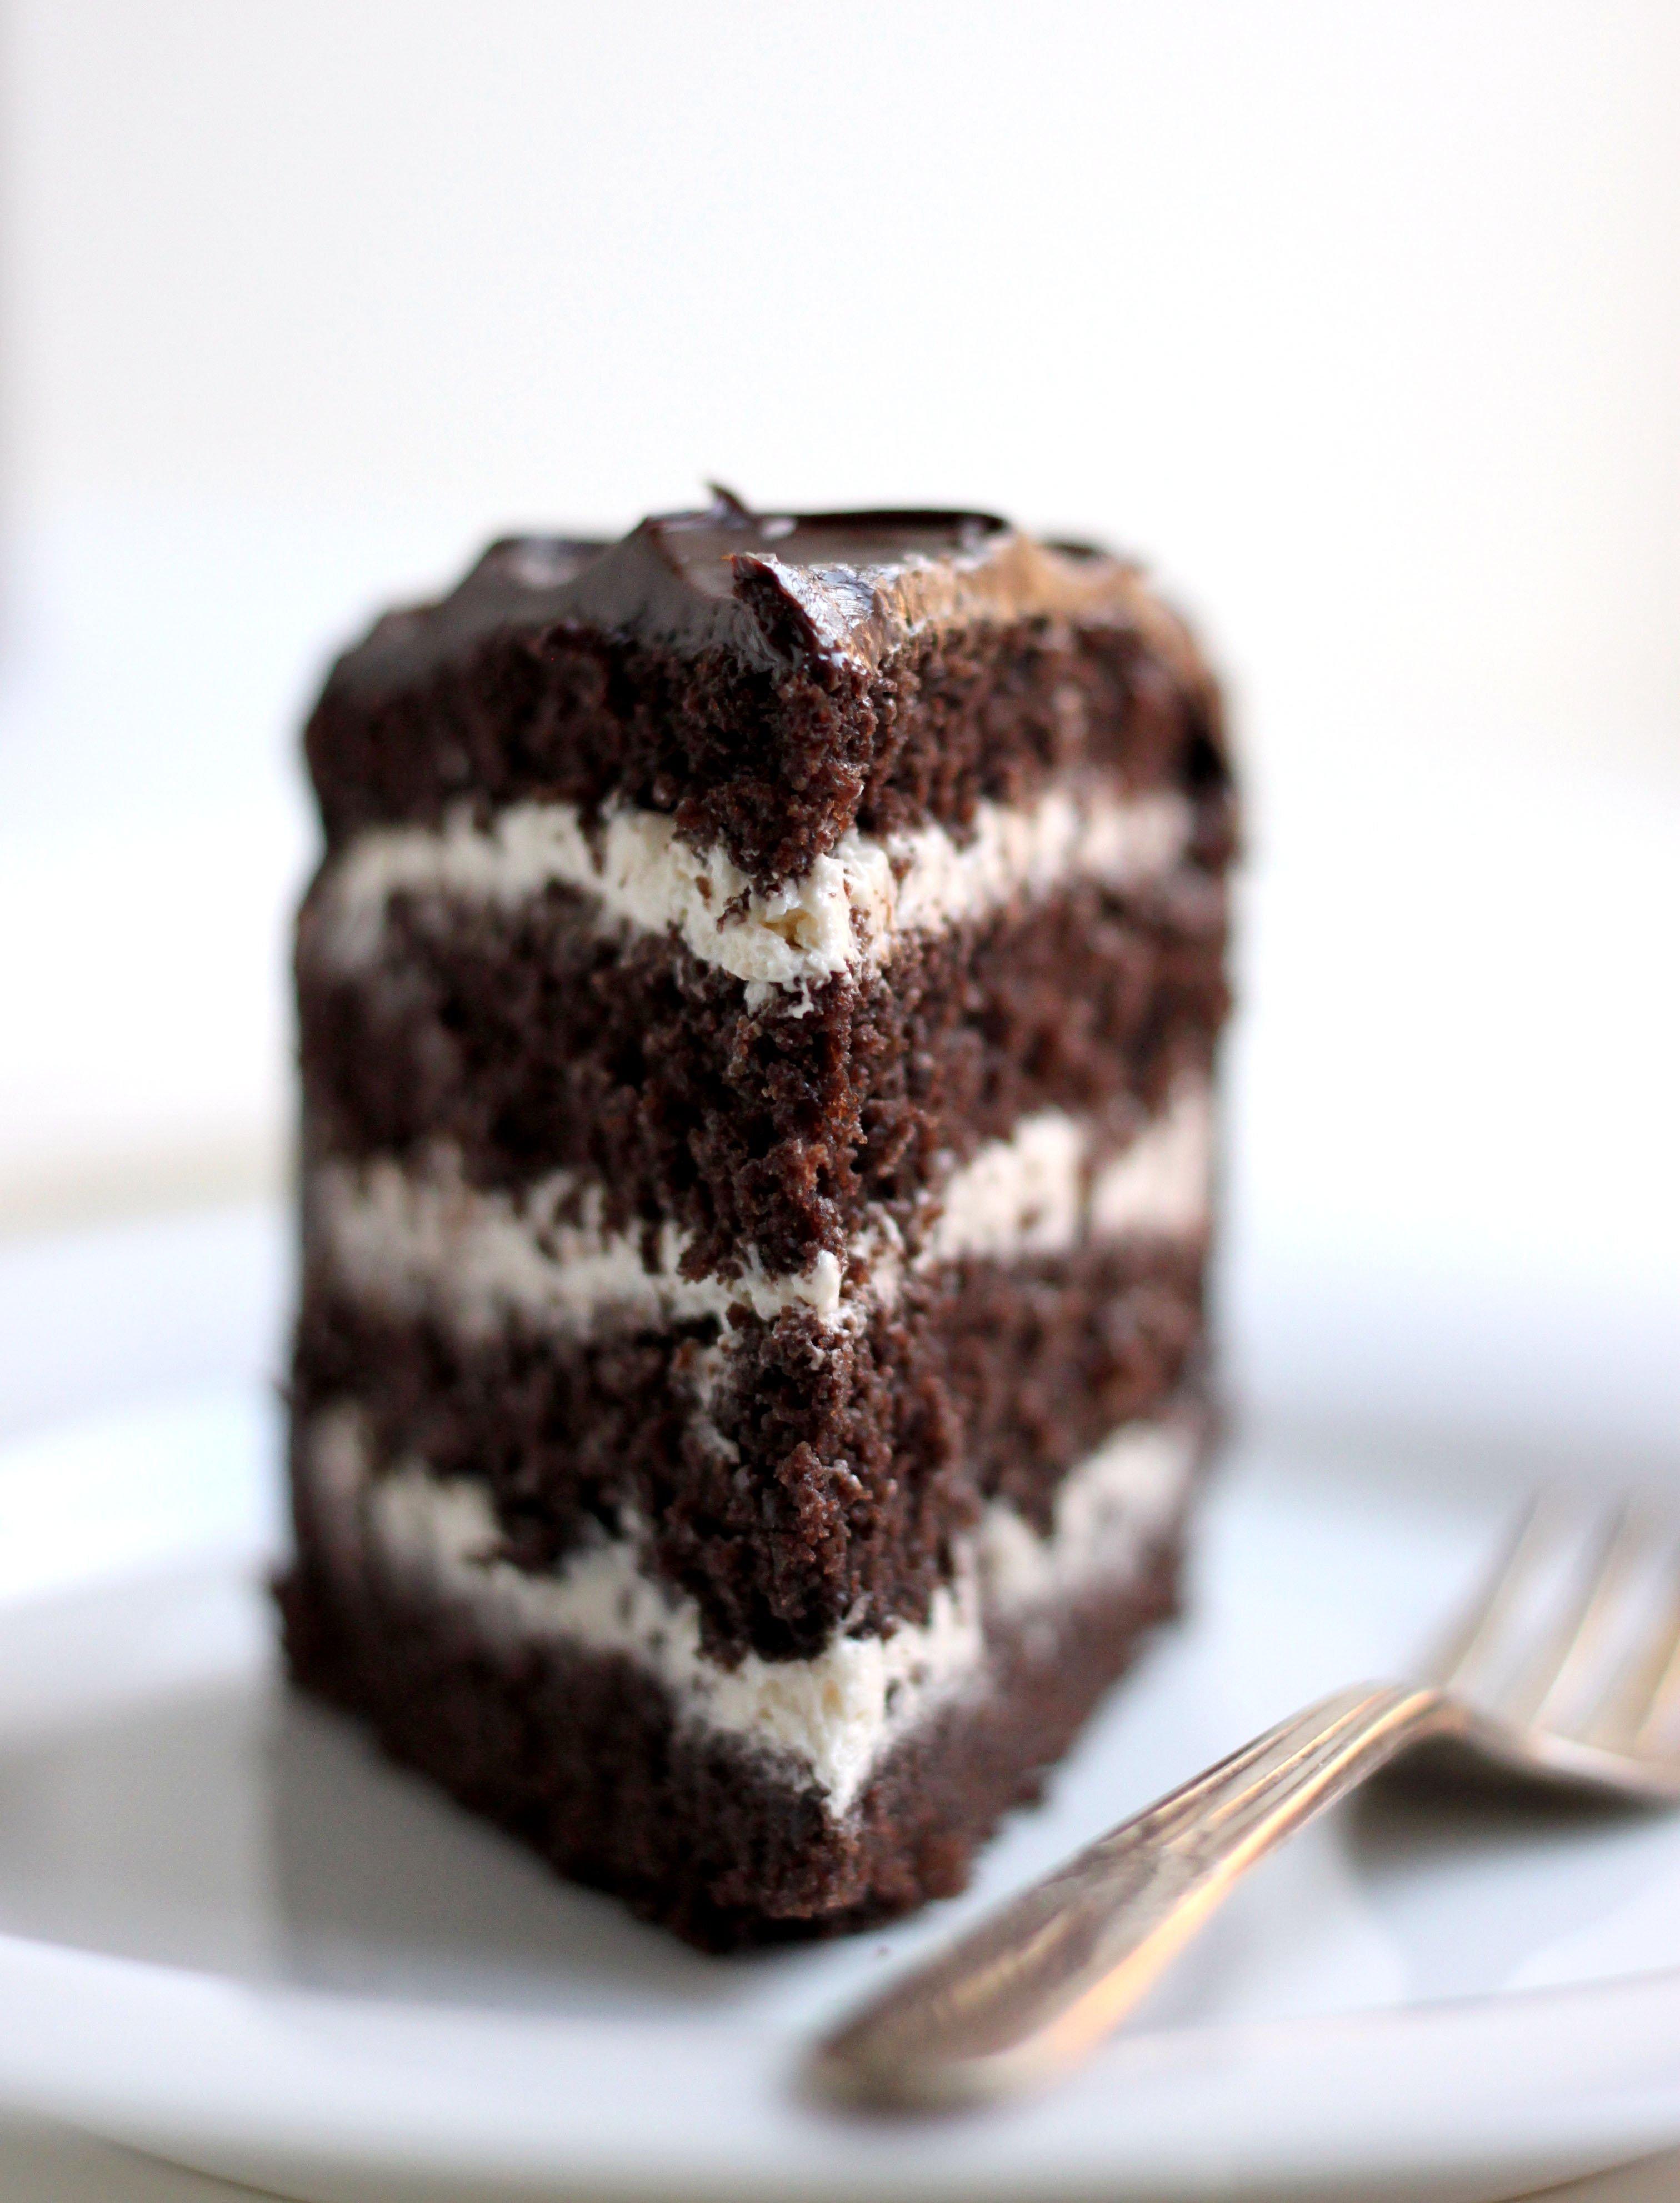 Salted Caramel Chocolate Cake The Fauxmartha